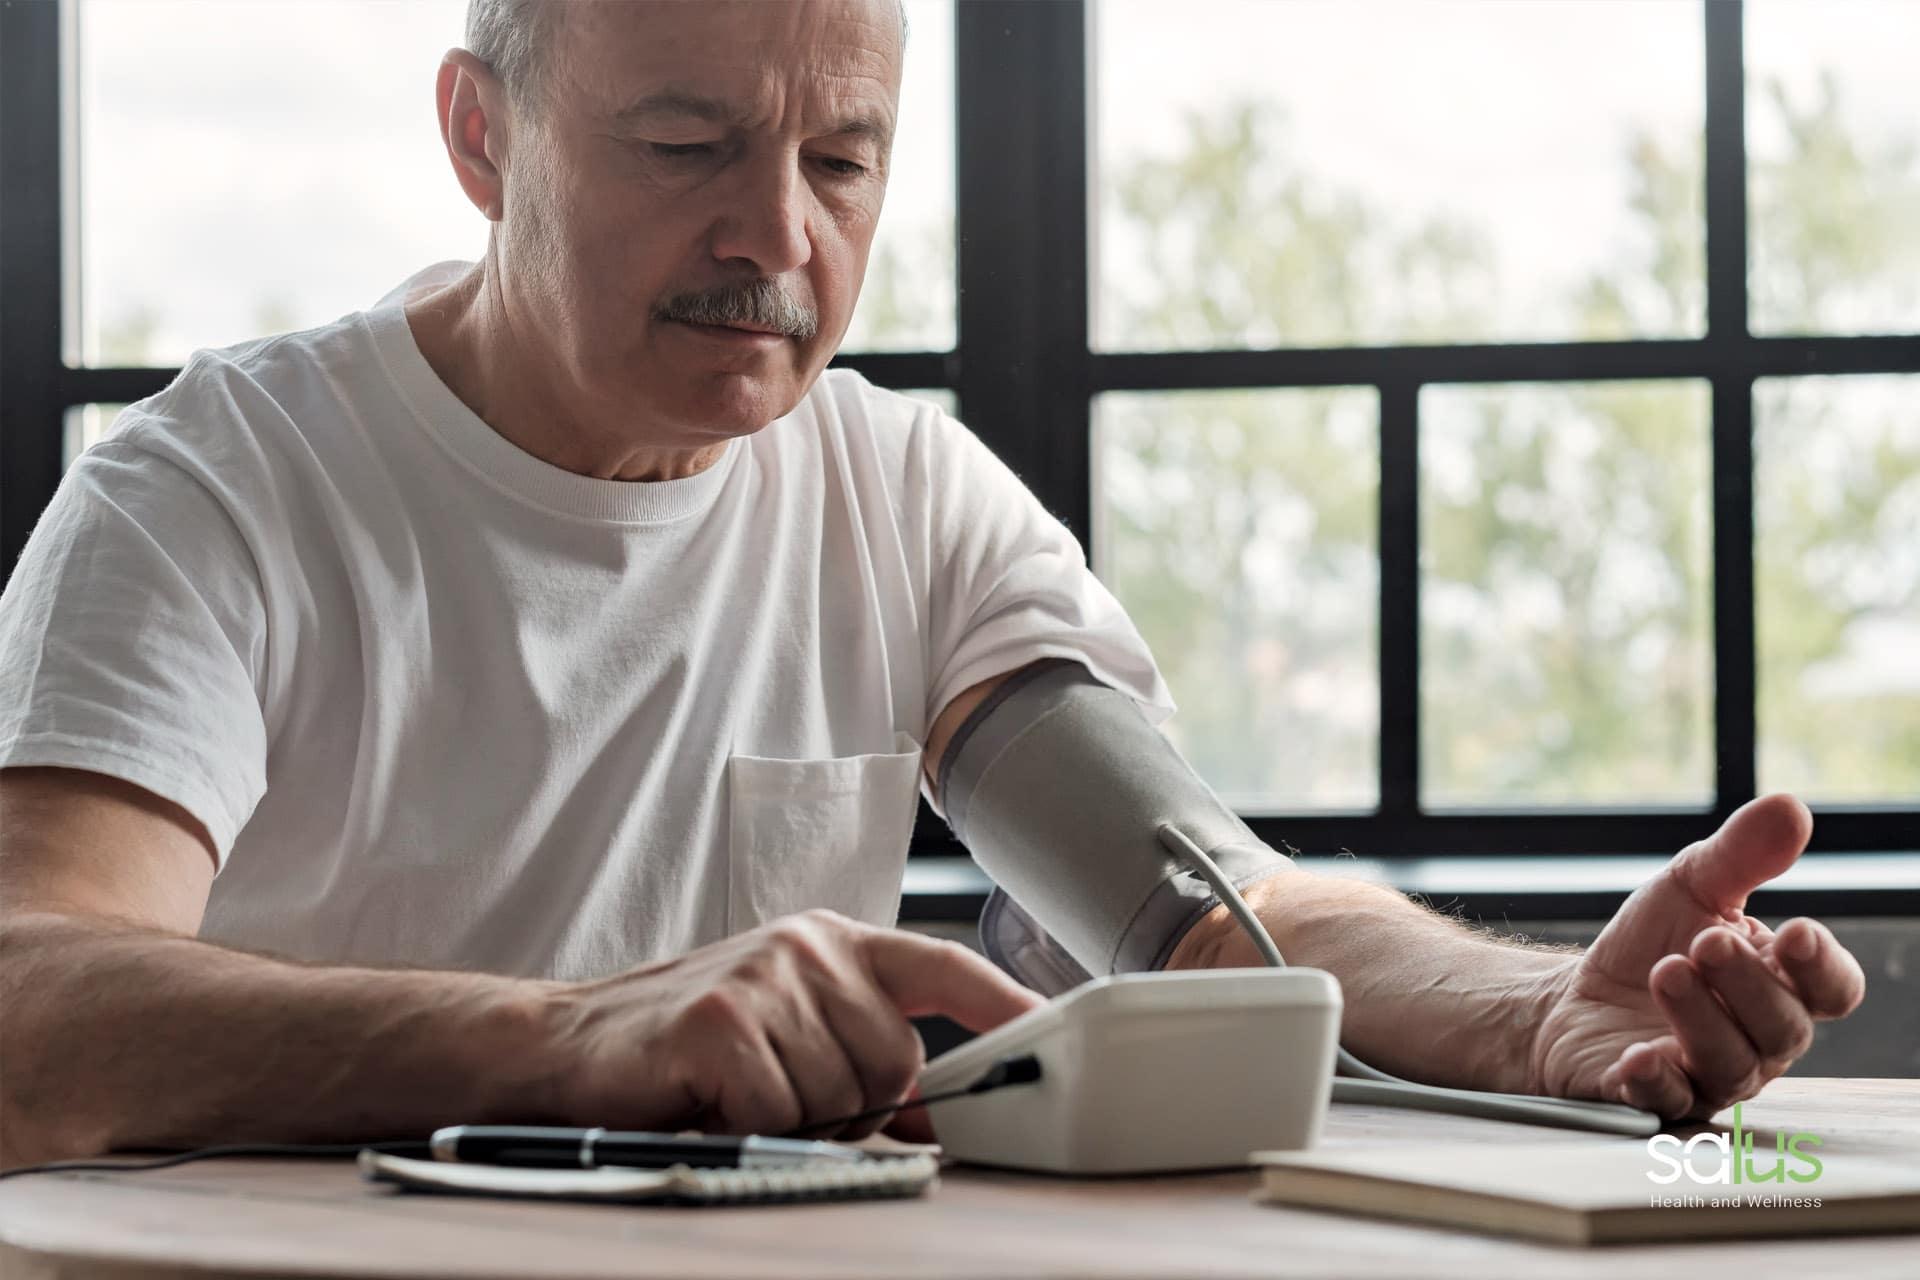 Salus blog L'ipertensione aumenta con l'età